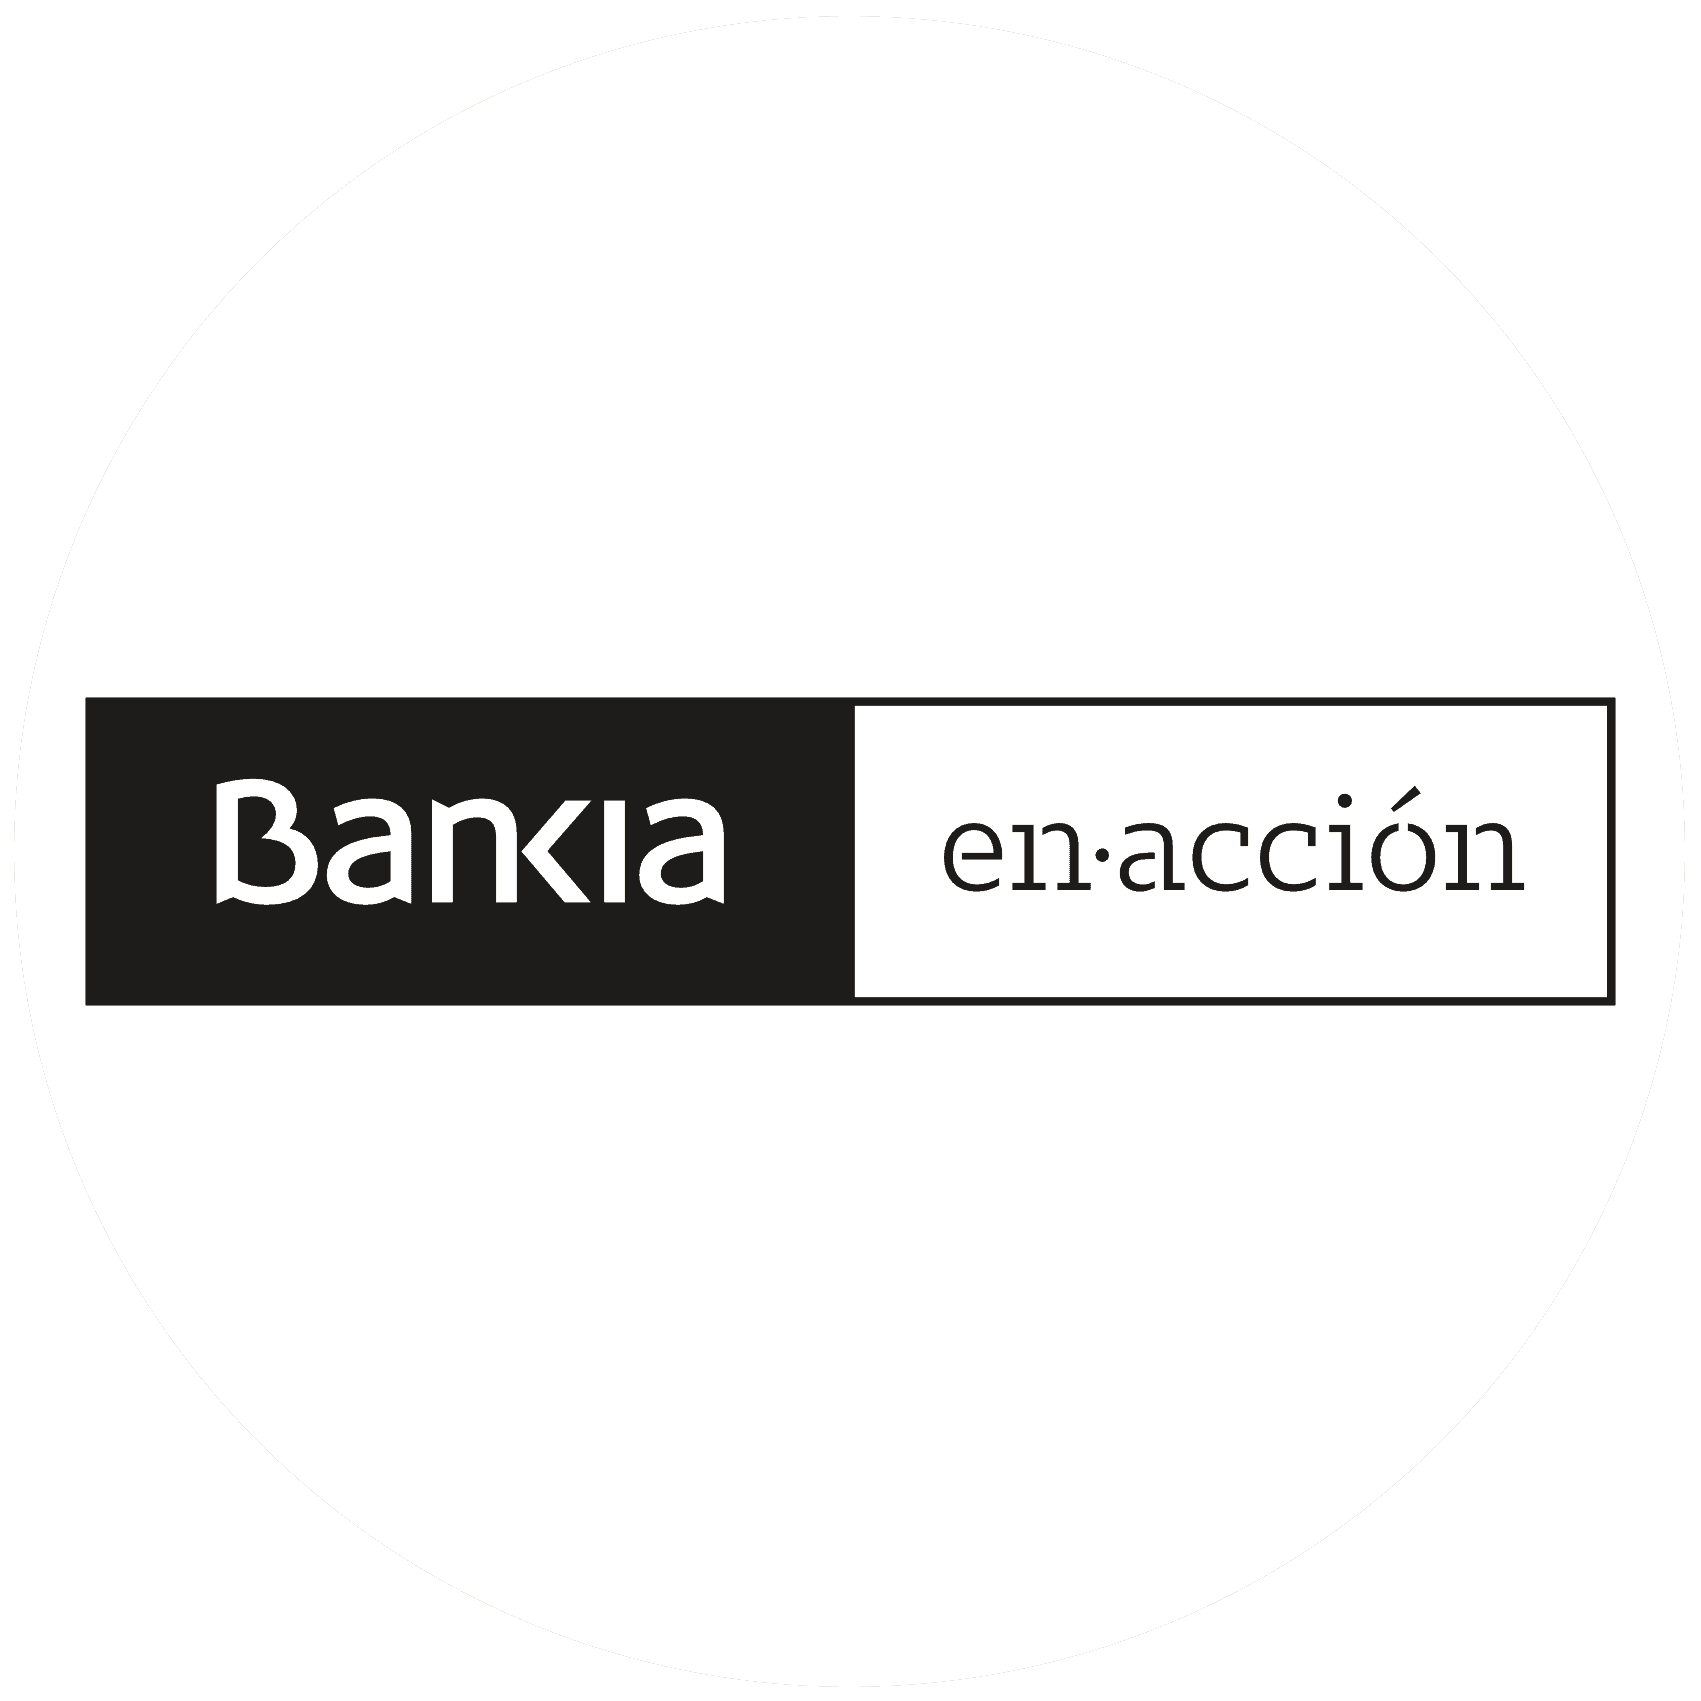 logo-bankia-en-accion